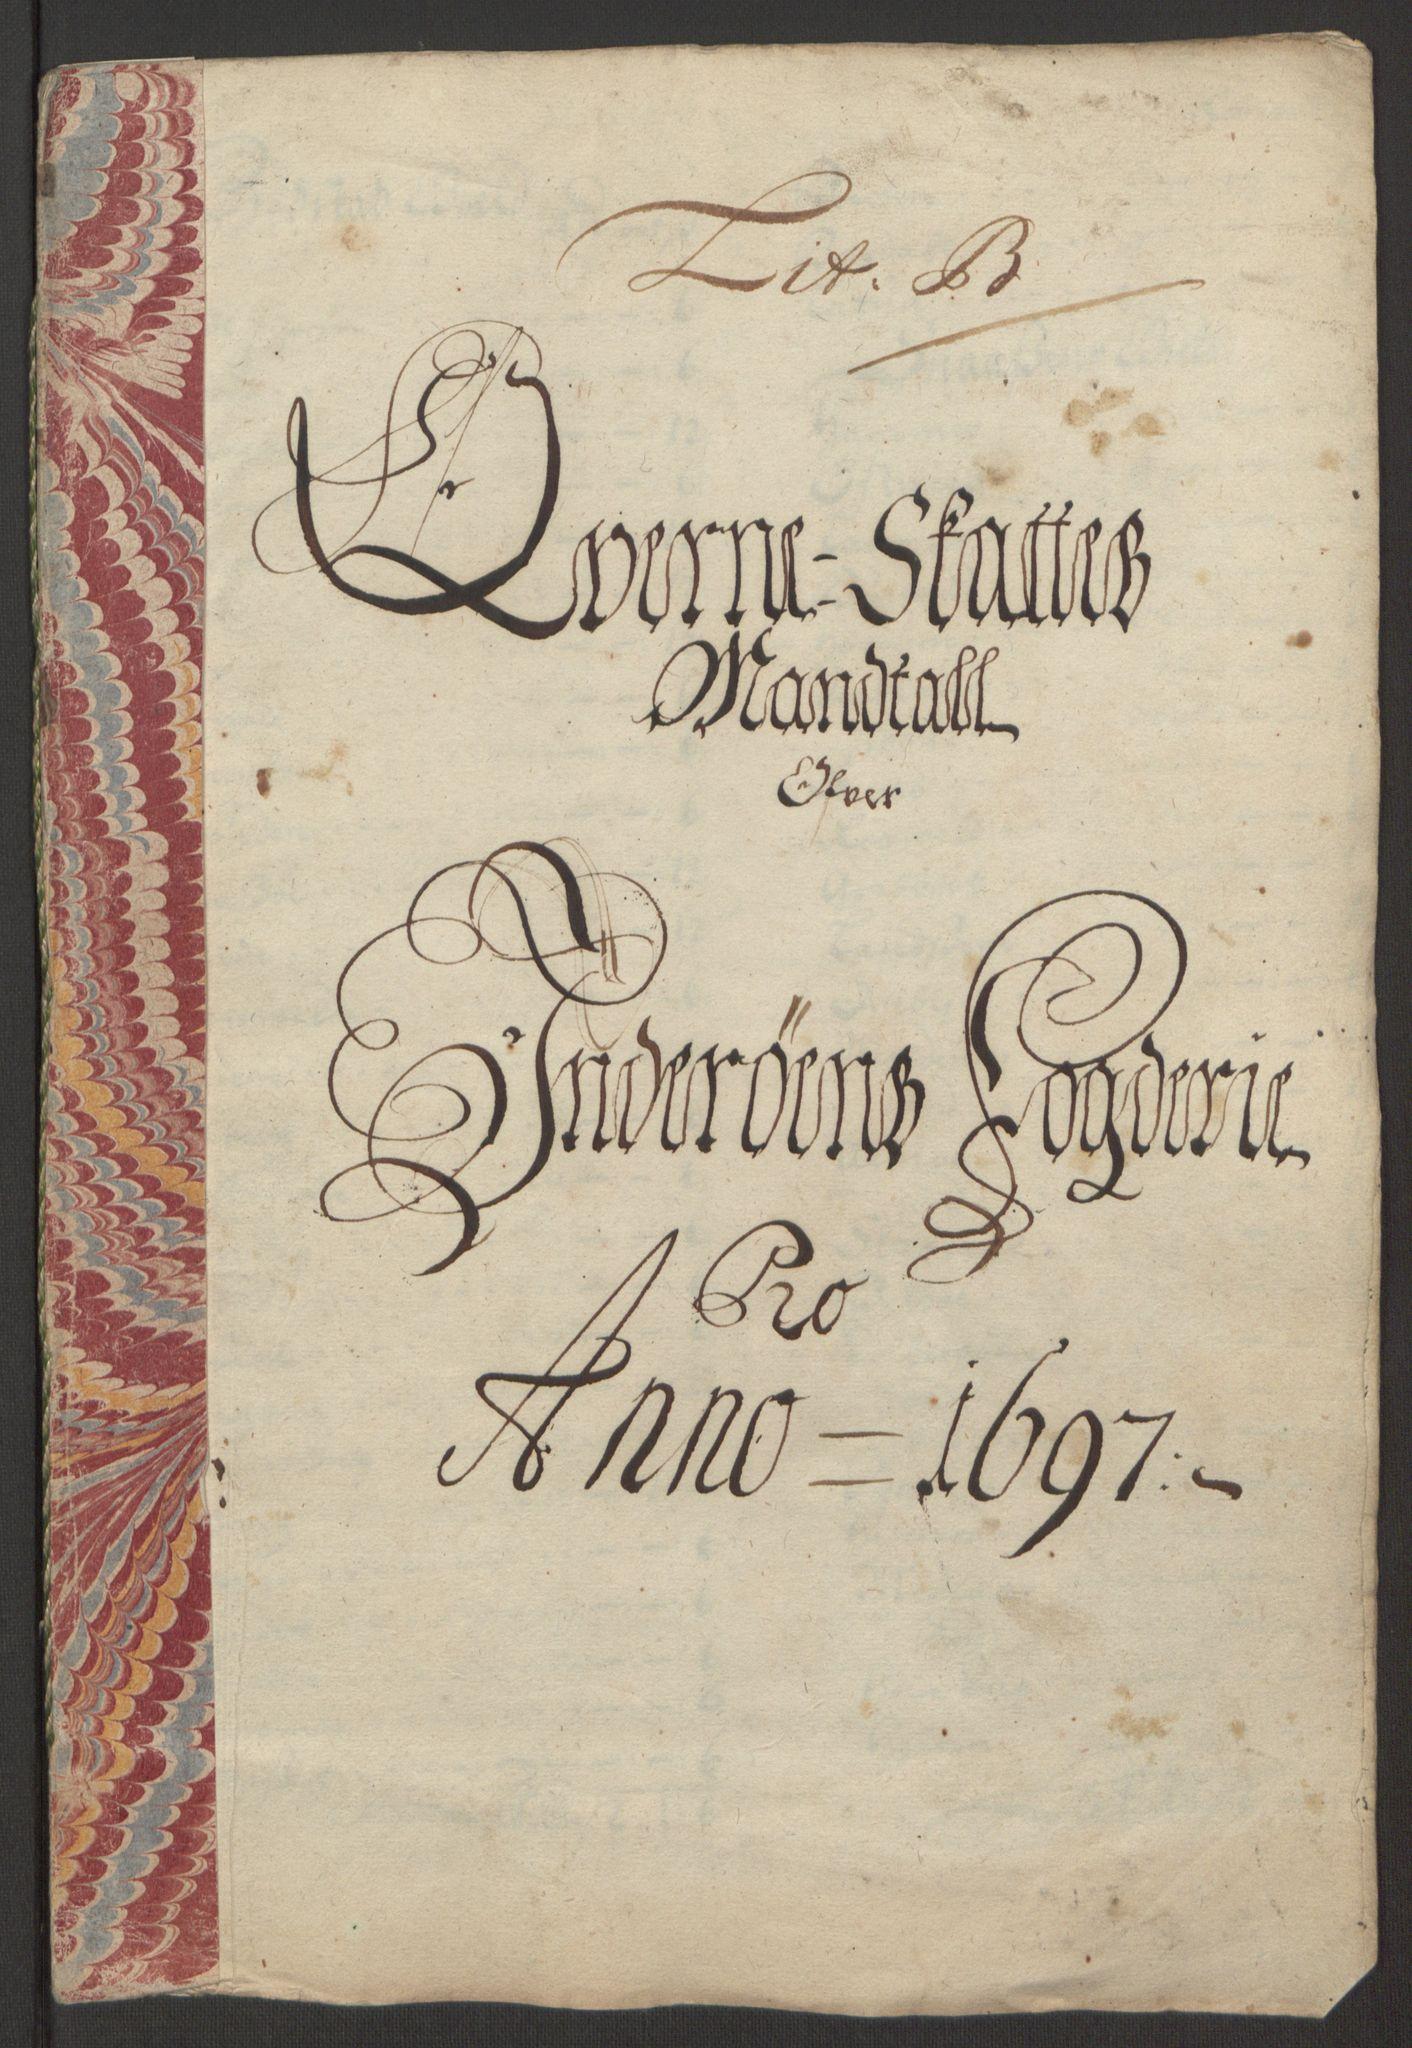 RA, Rentekammeret inntil 1814, Reviderte regnskaper, Fogderegnskap, R63/L4309: Fogderegnskap Inderøy, 1695-1697, s. 392